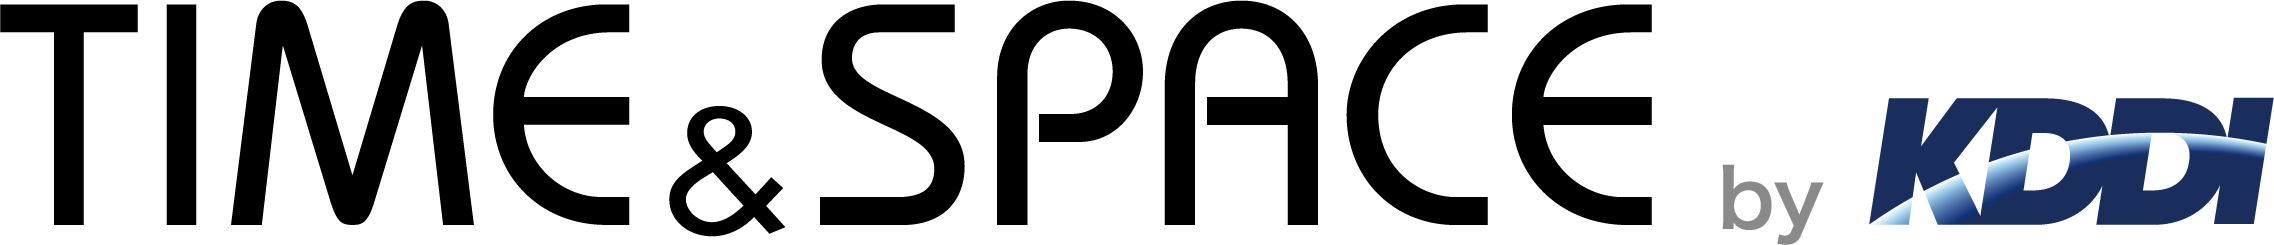 KDDIがお届けするIT×カルチャーマガジン TIME&SPACE by KDDI